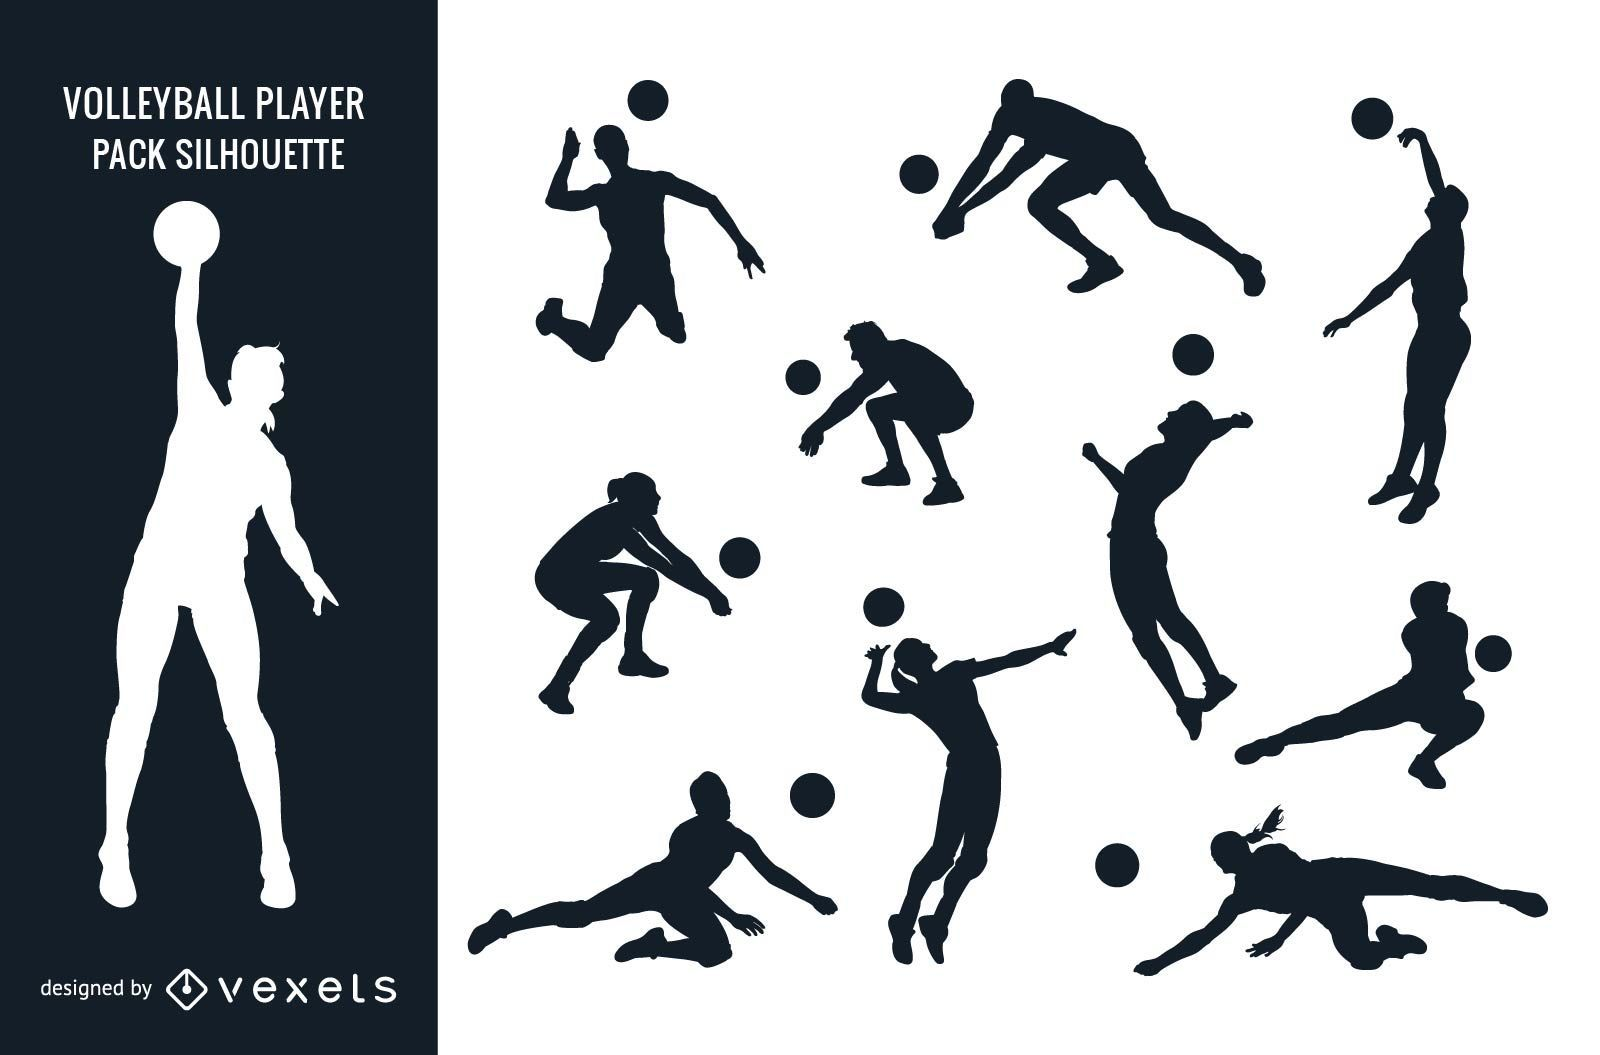 Silueta de paquete de jugador de voleibol femenino masculino